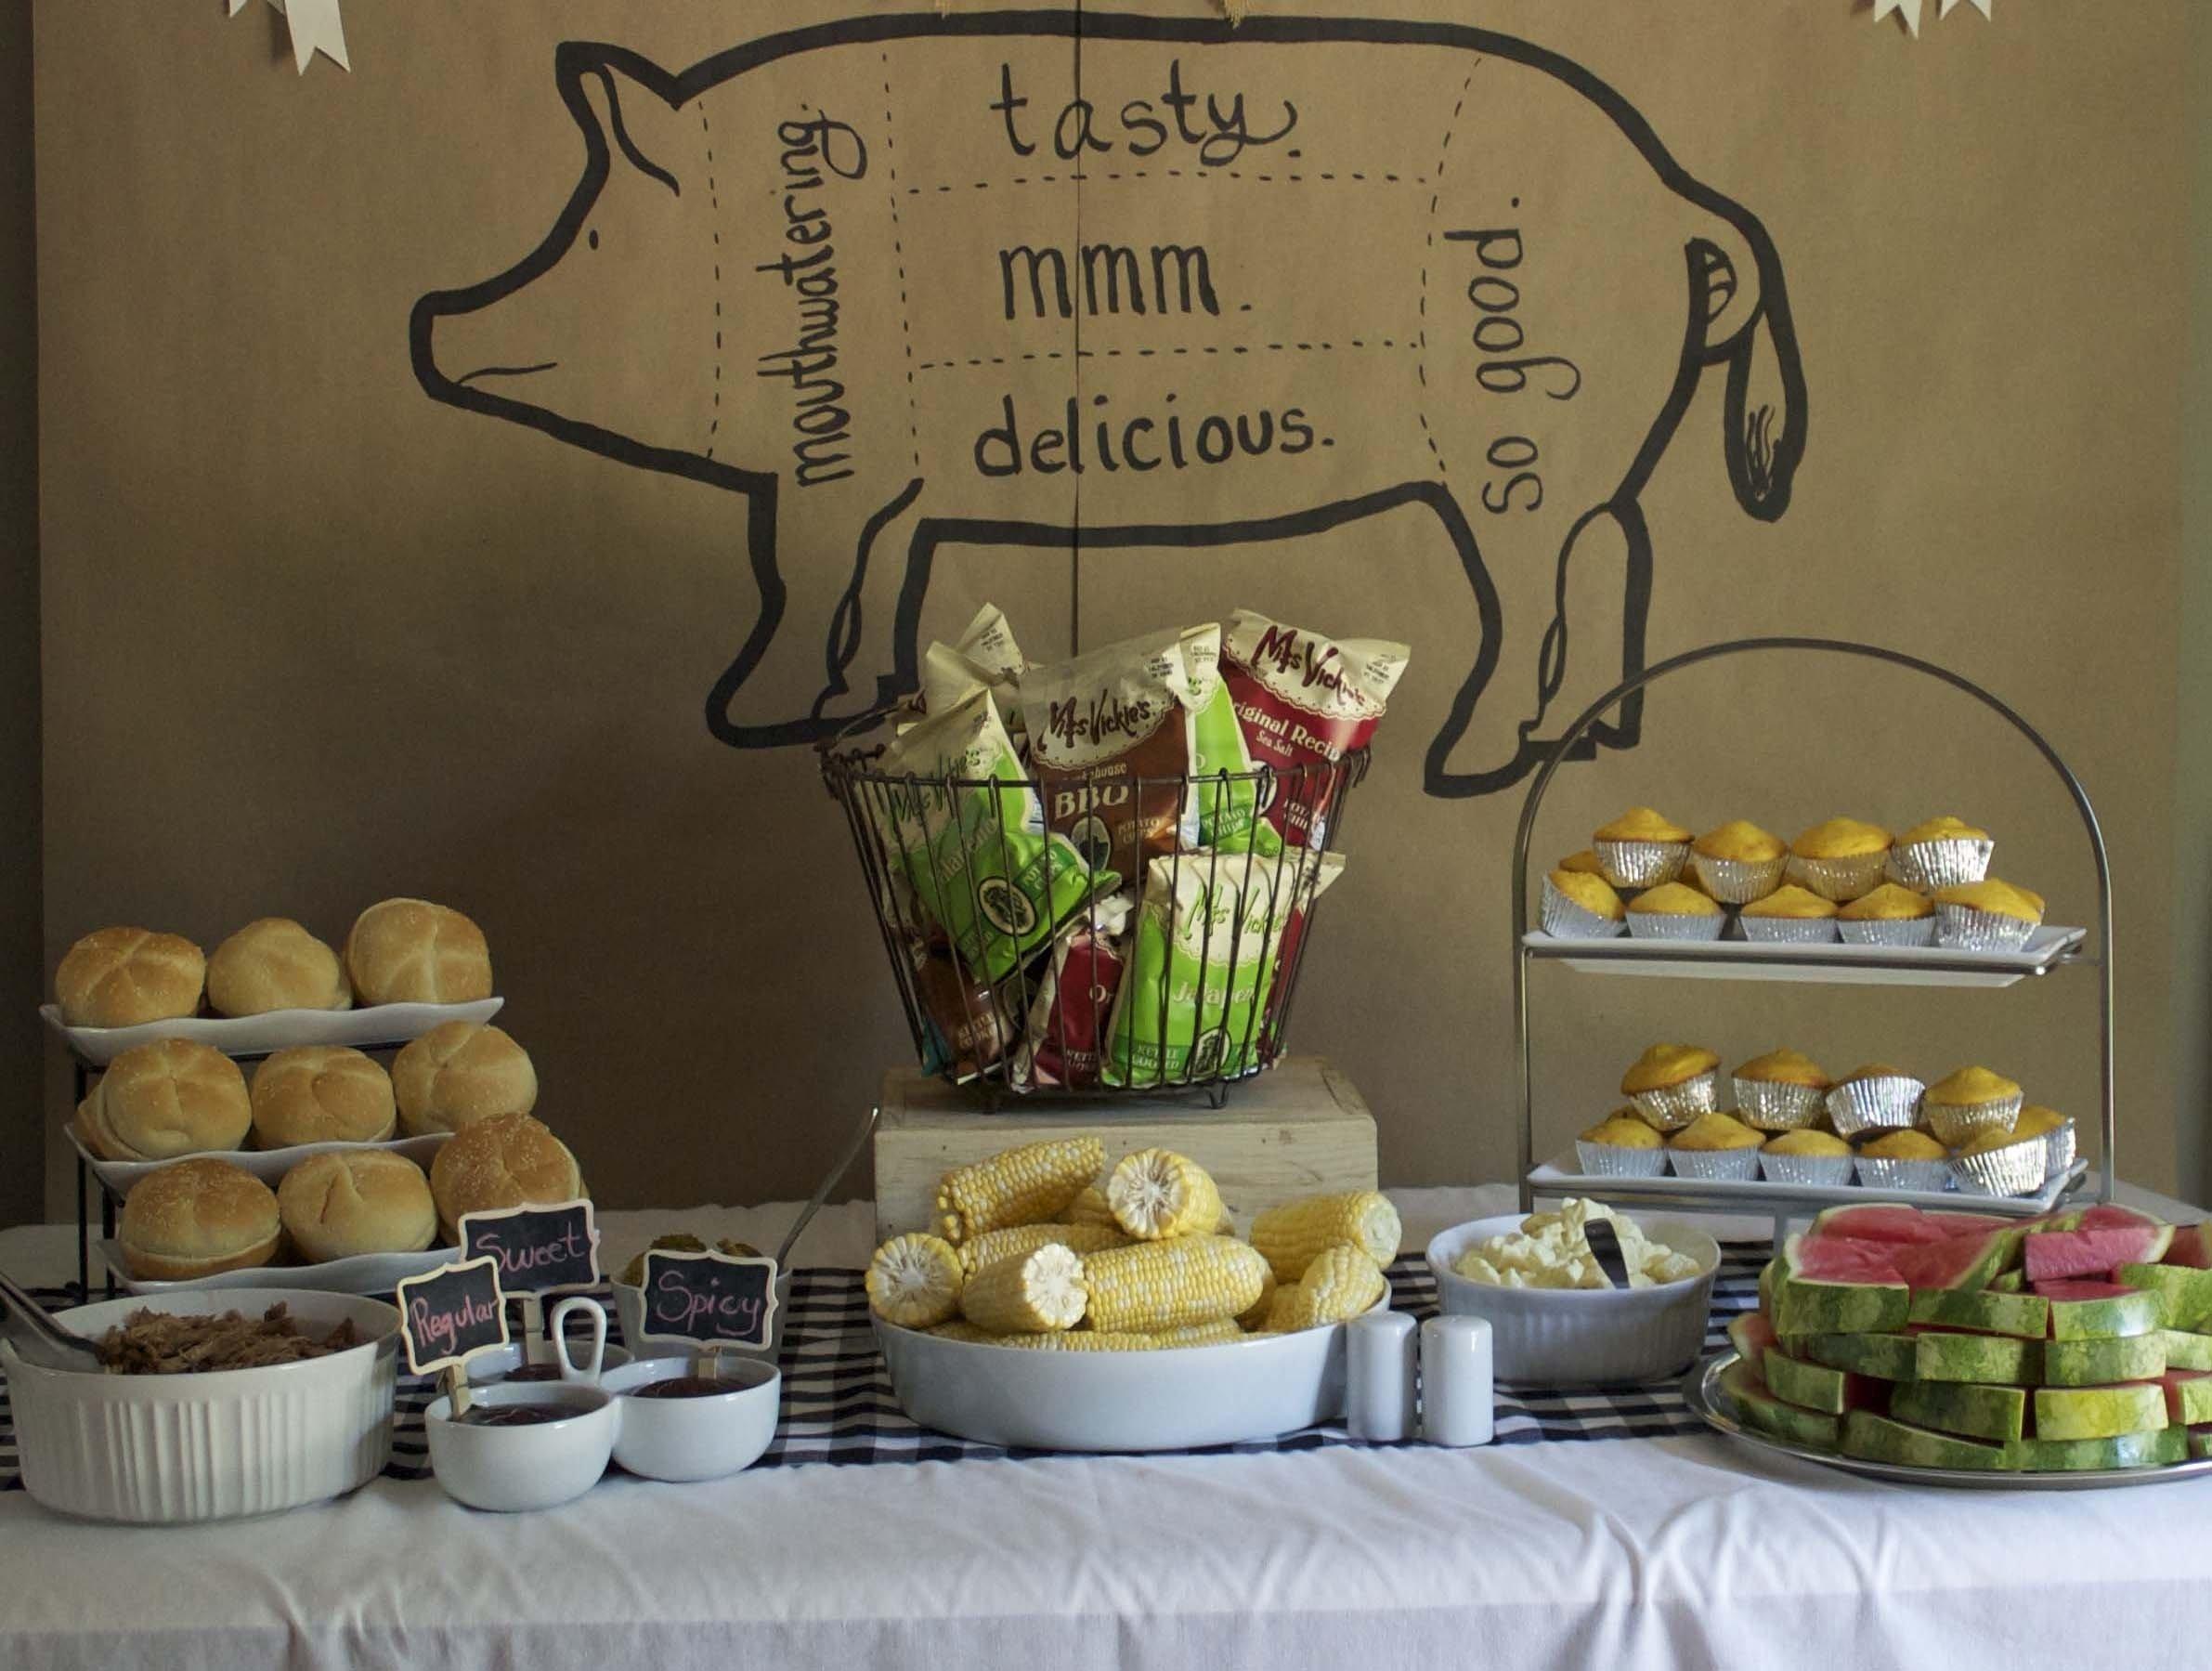 10 Fabulous Food Ideas For Graduation Party graduation food ideas pear tree blog 5